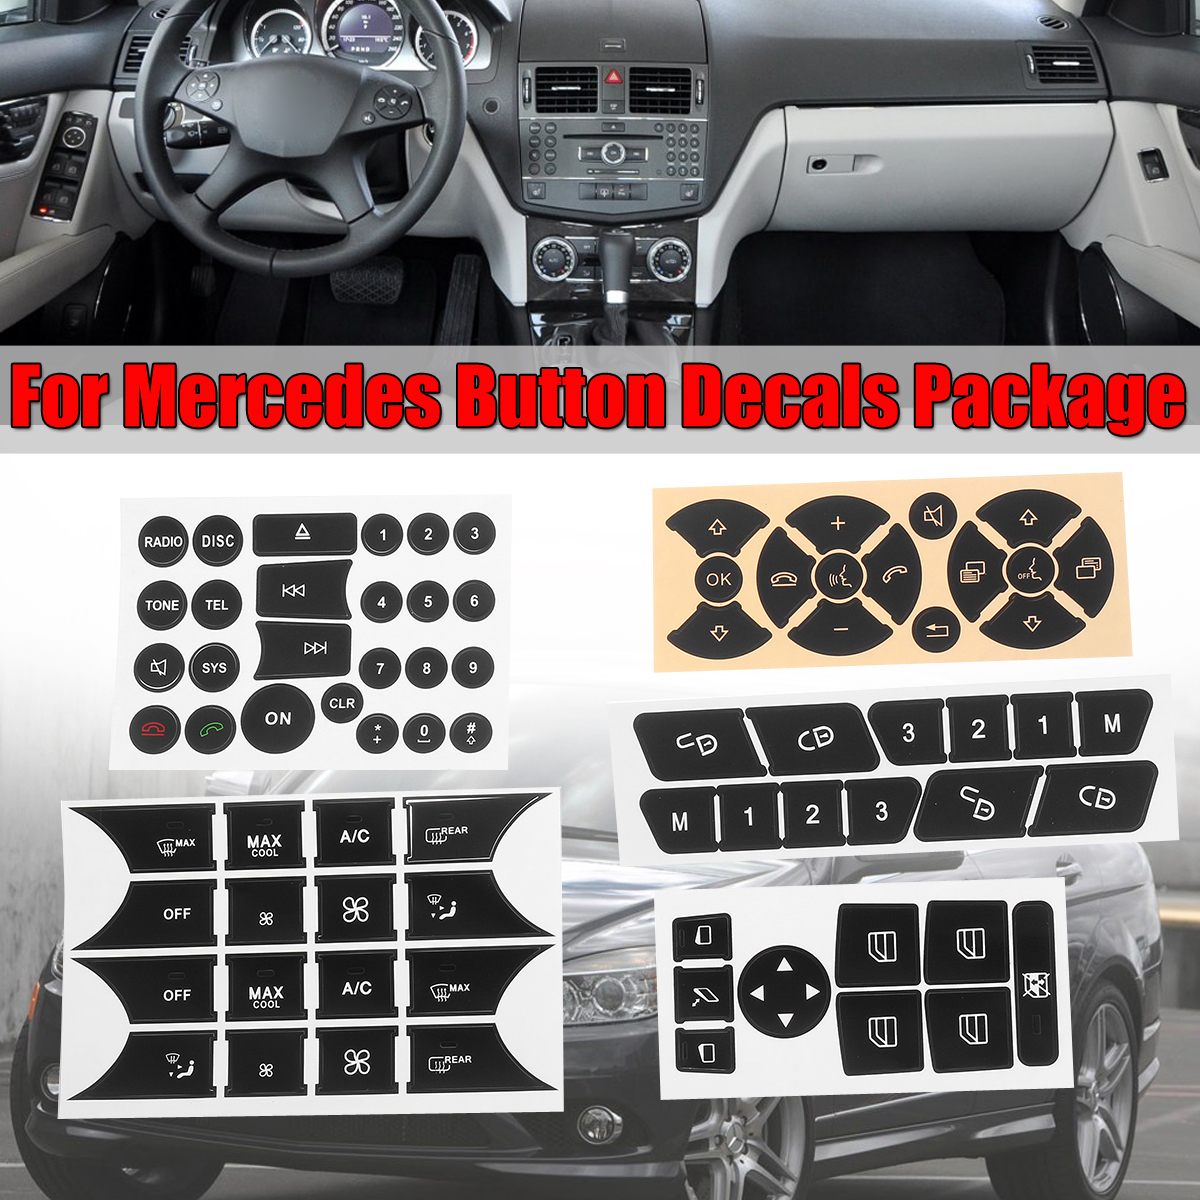 Car Button Repair Steering AC Door Lock Window Decals Stickers New For Mercedes For Benz 2007-2014 Button Repair Sticker Decal